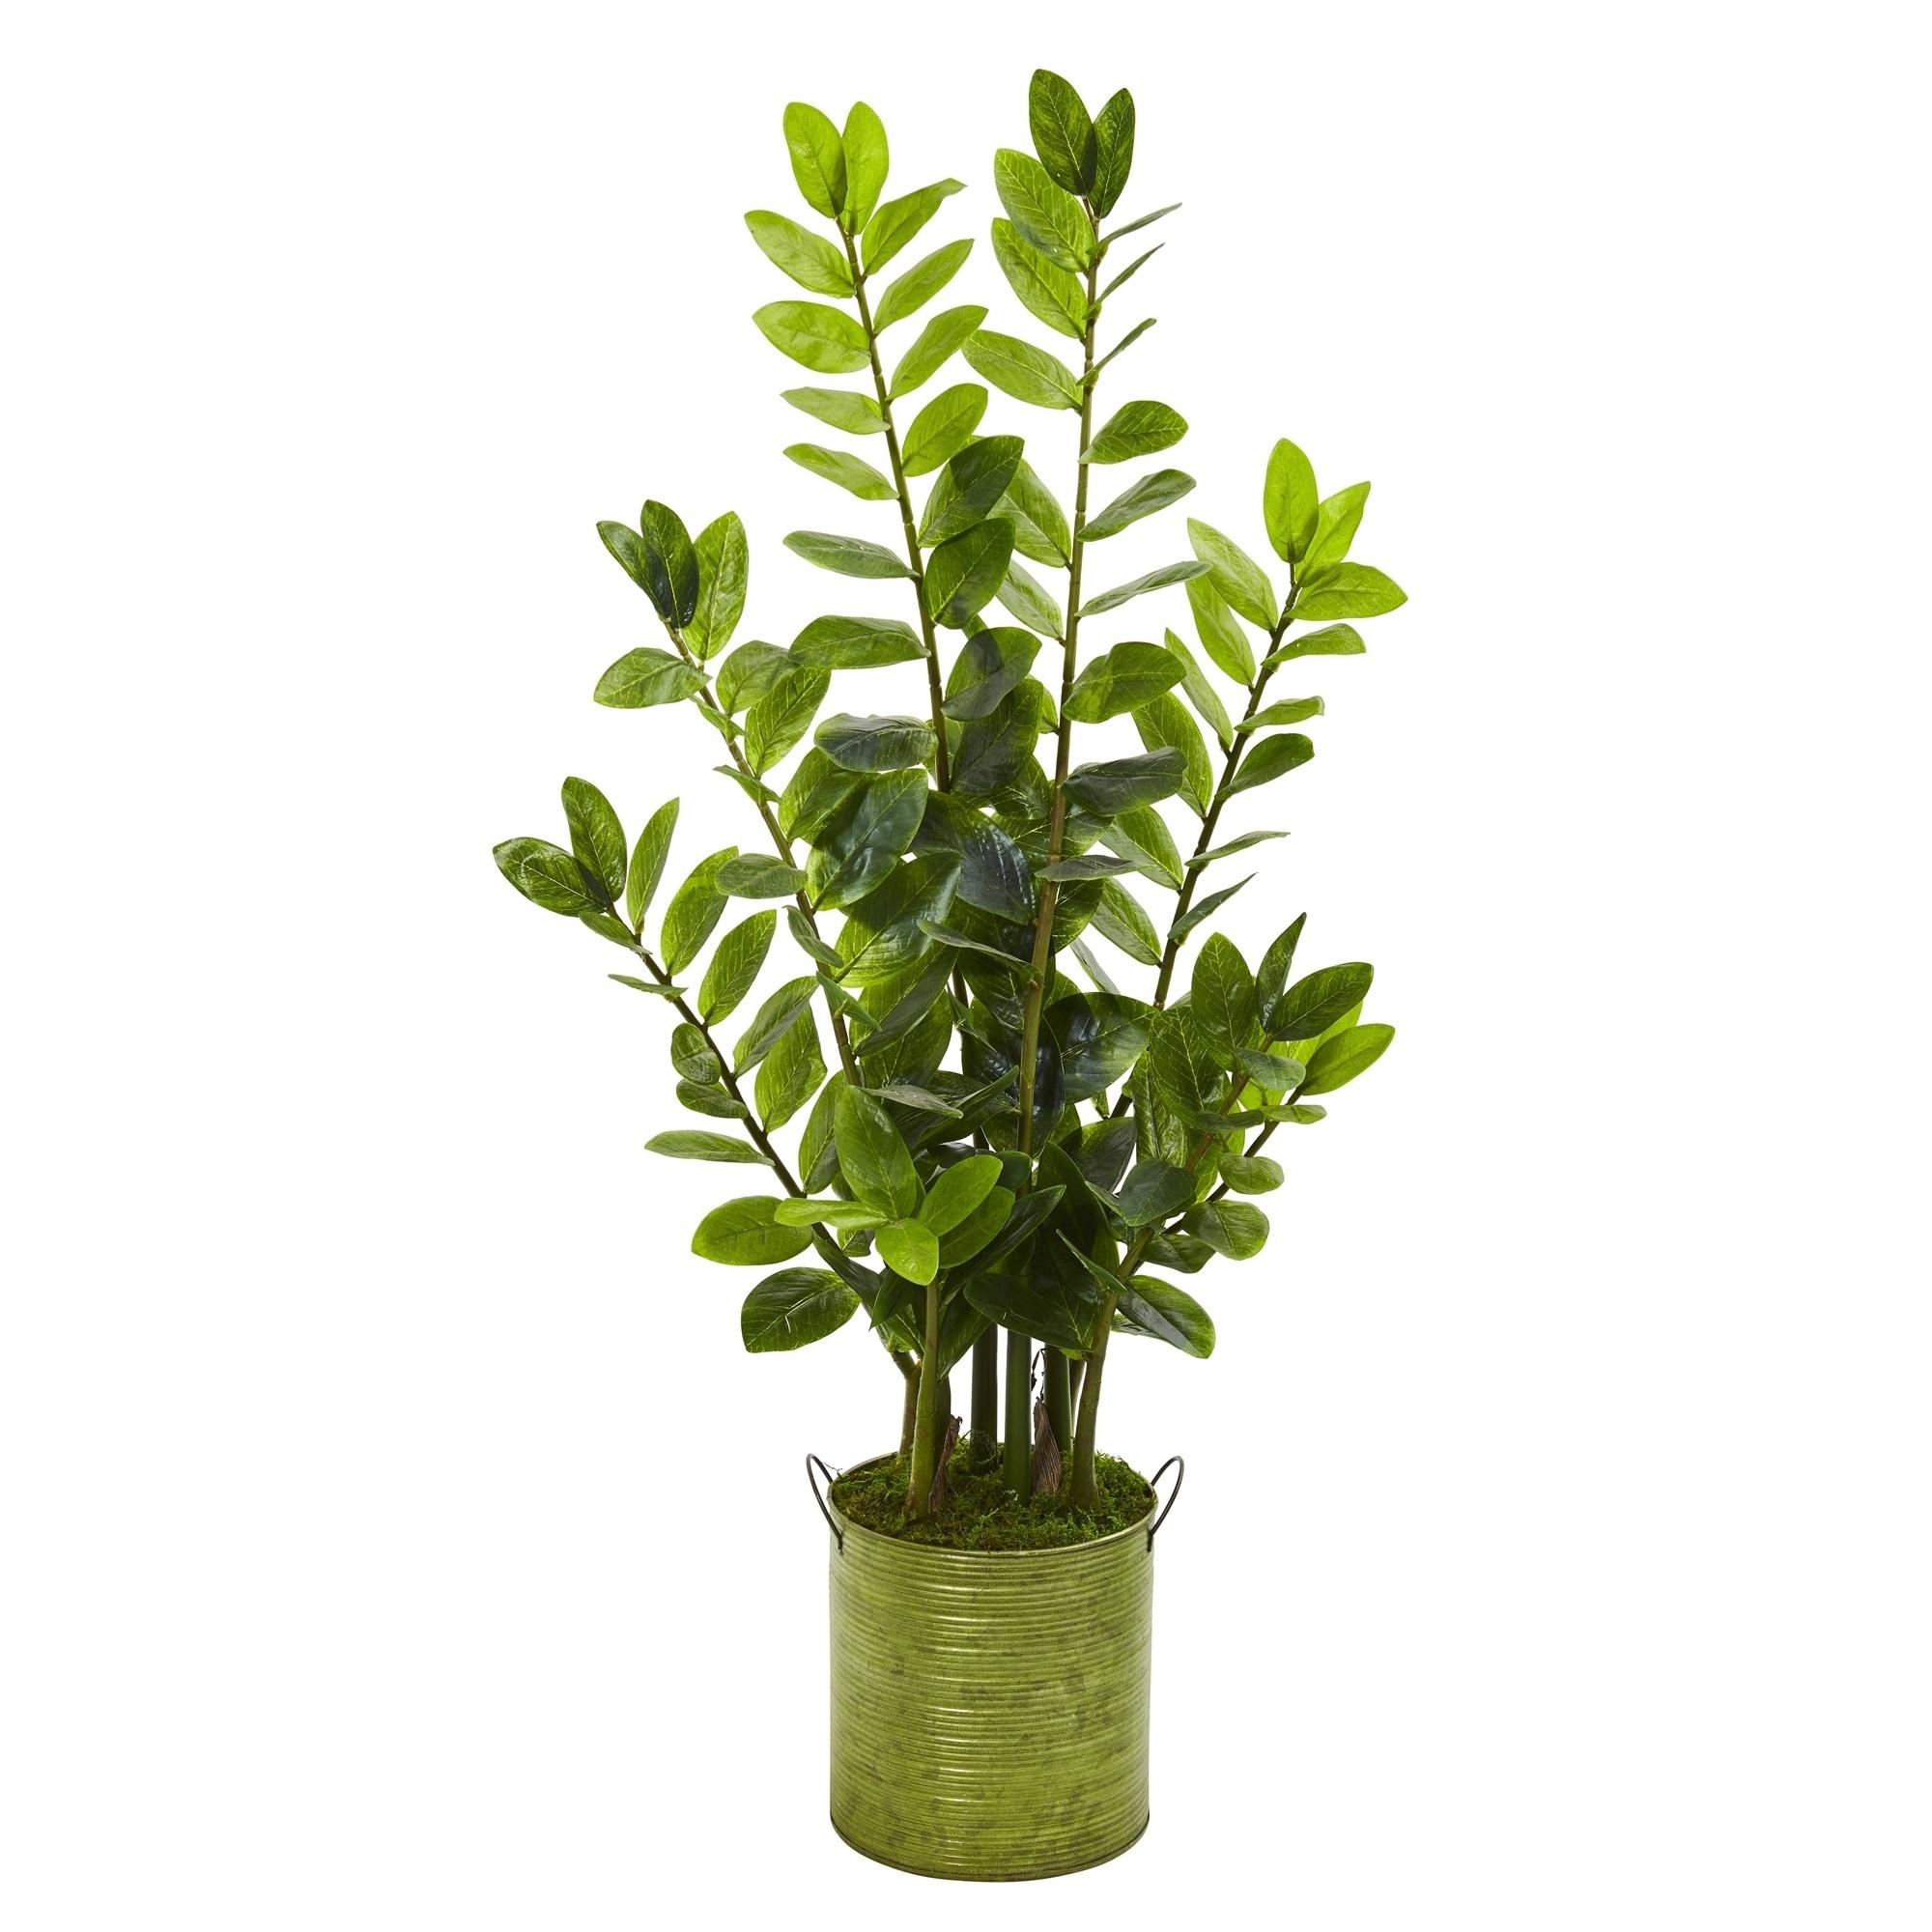 38 Zamioculcas Artificial Plant in Green Planter